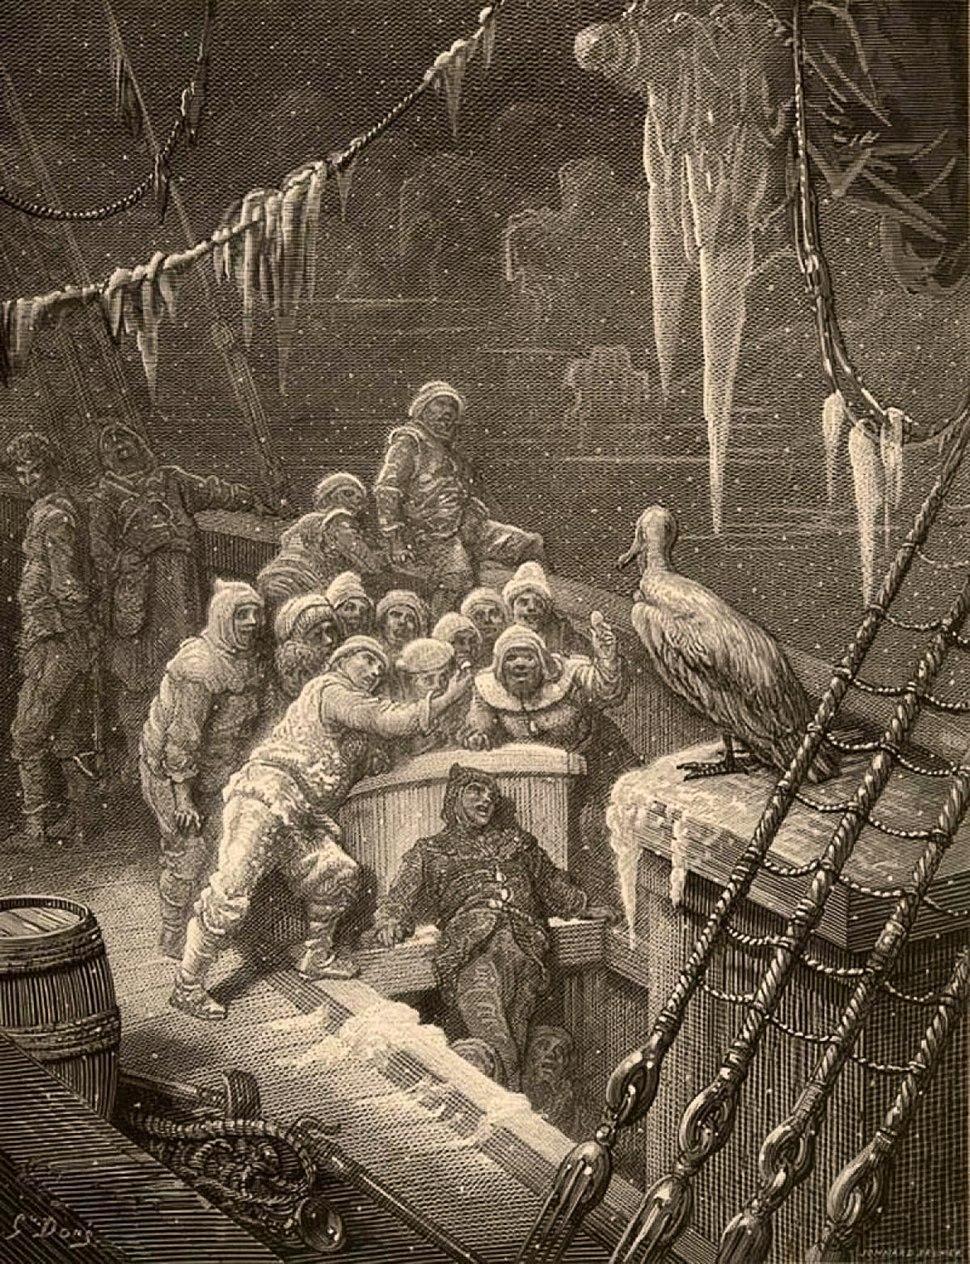 Rime of the Ancient Mariner-Albatross-Dore